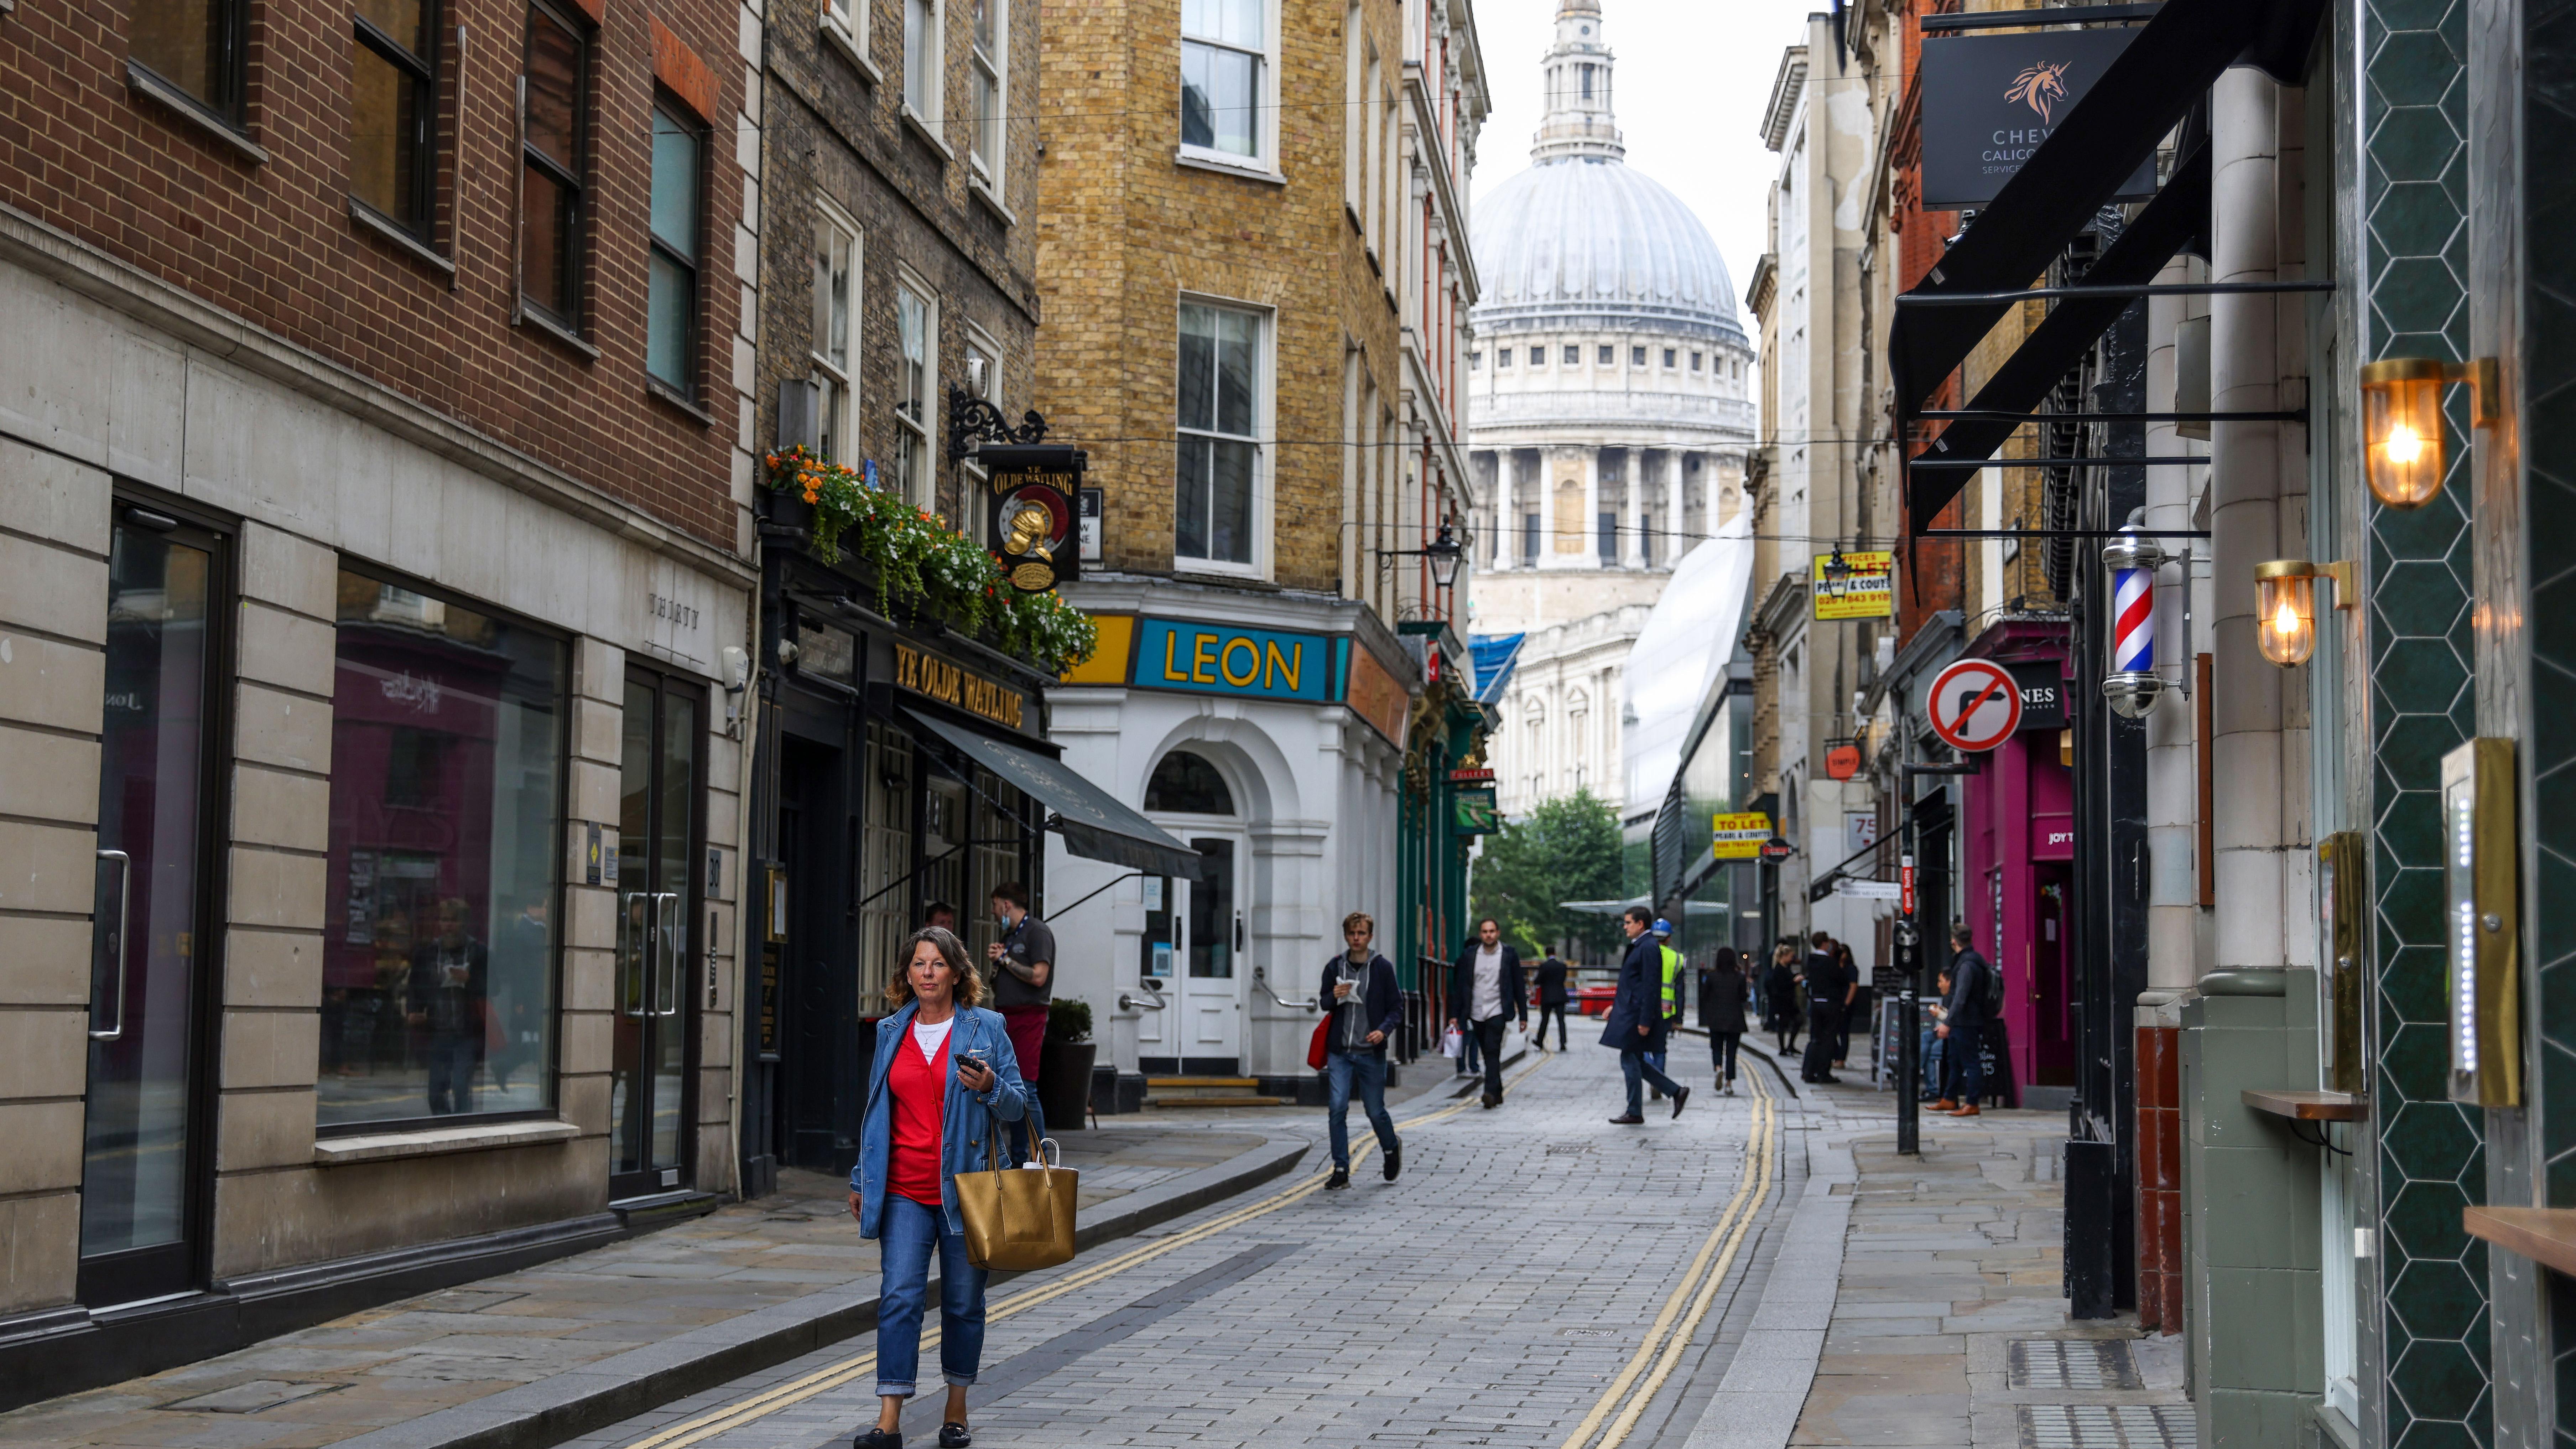 A pedestrian walks along Watling Street in view of St. Paul's Cathedral in London.